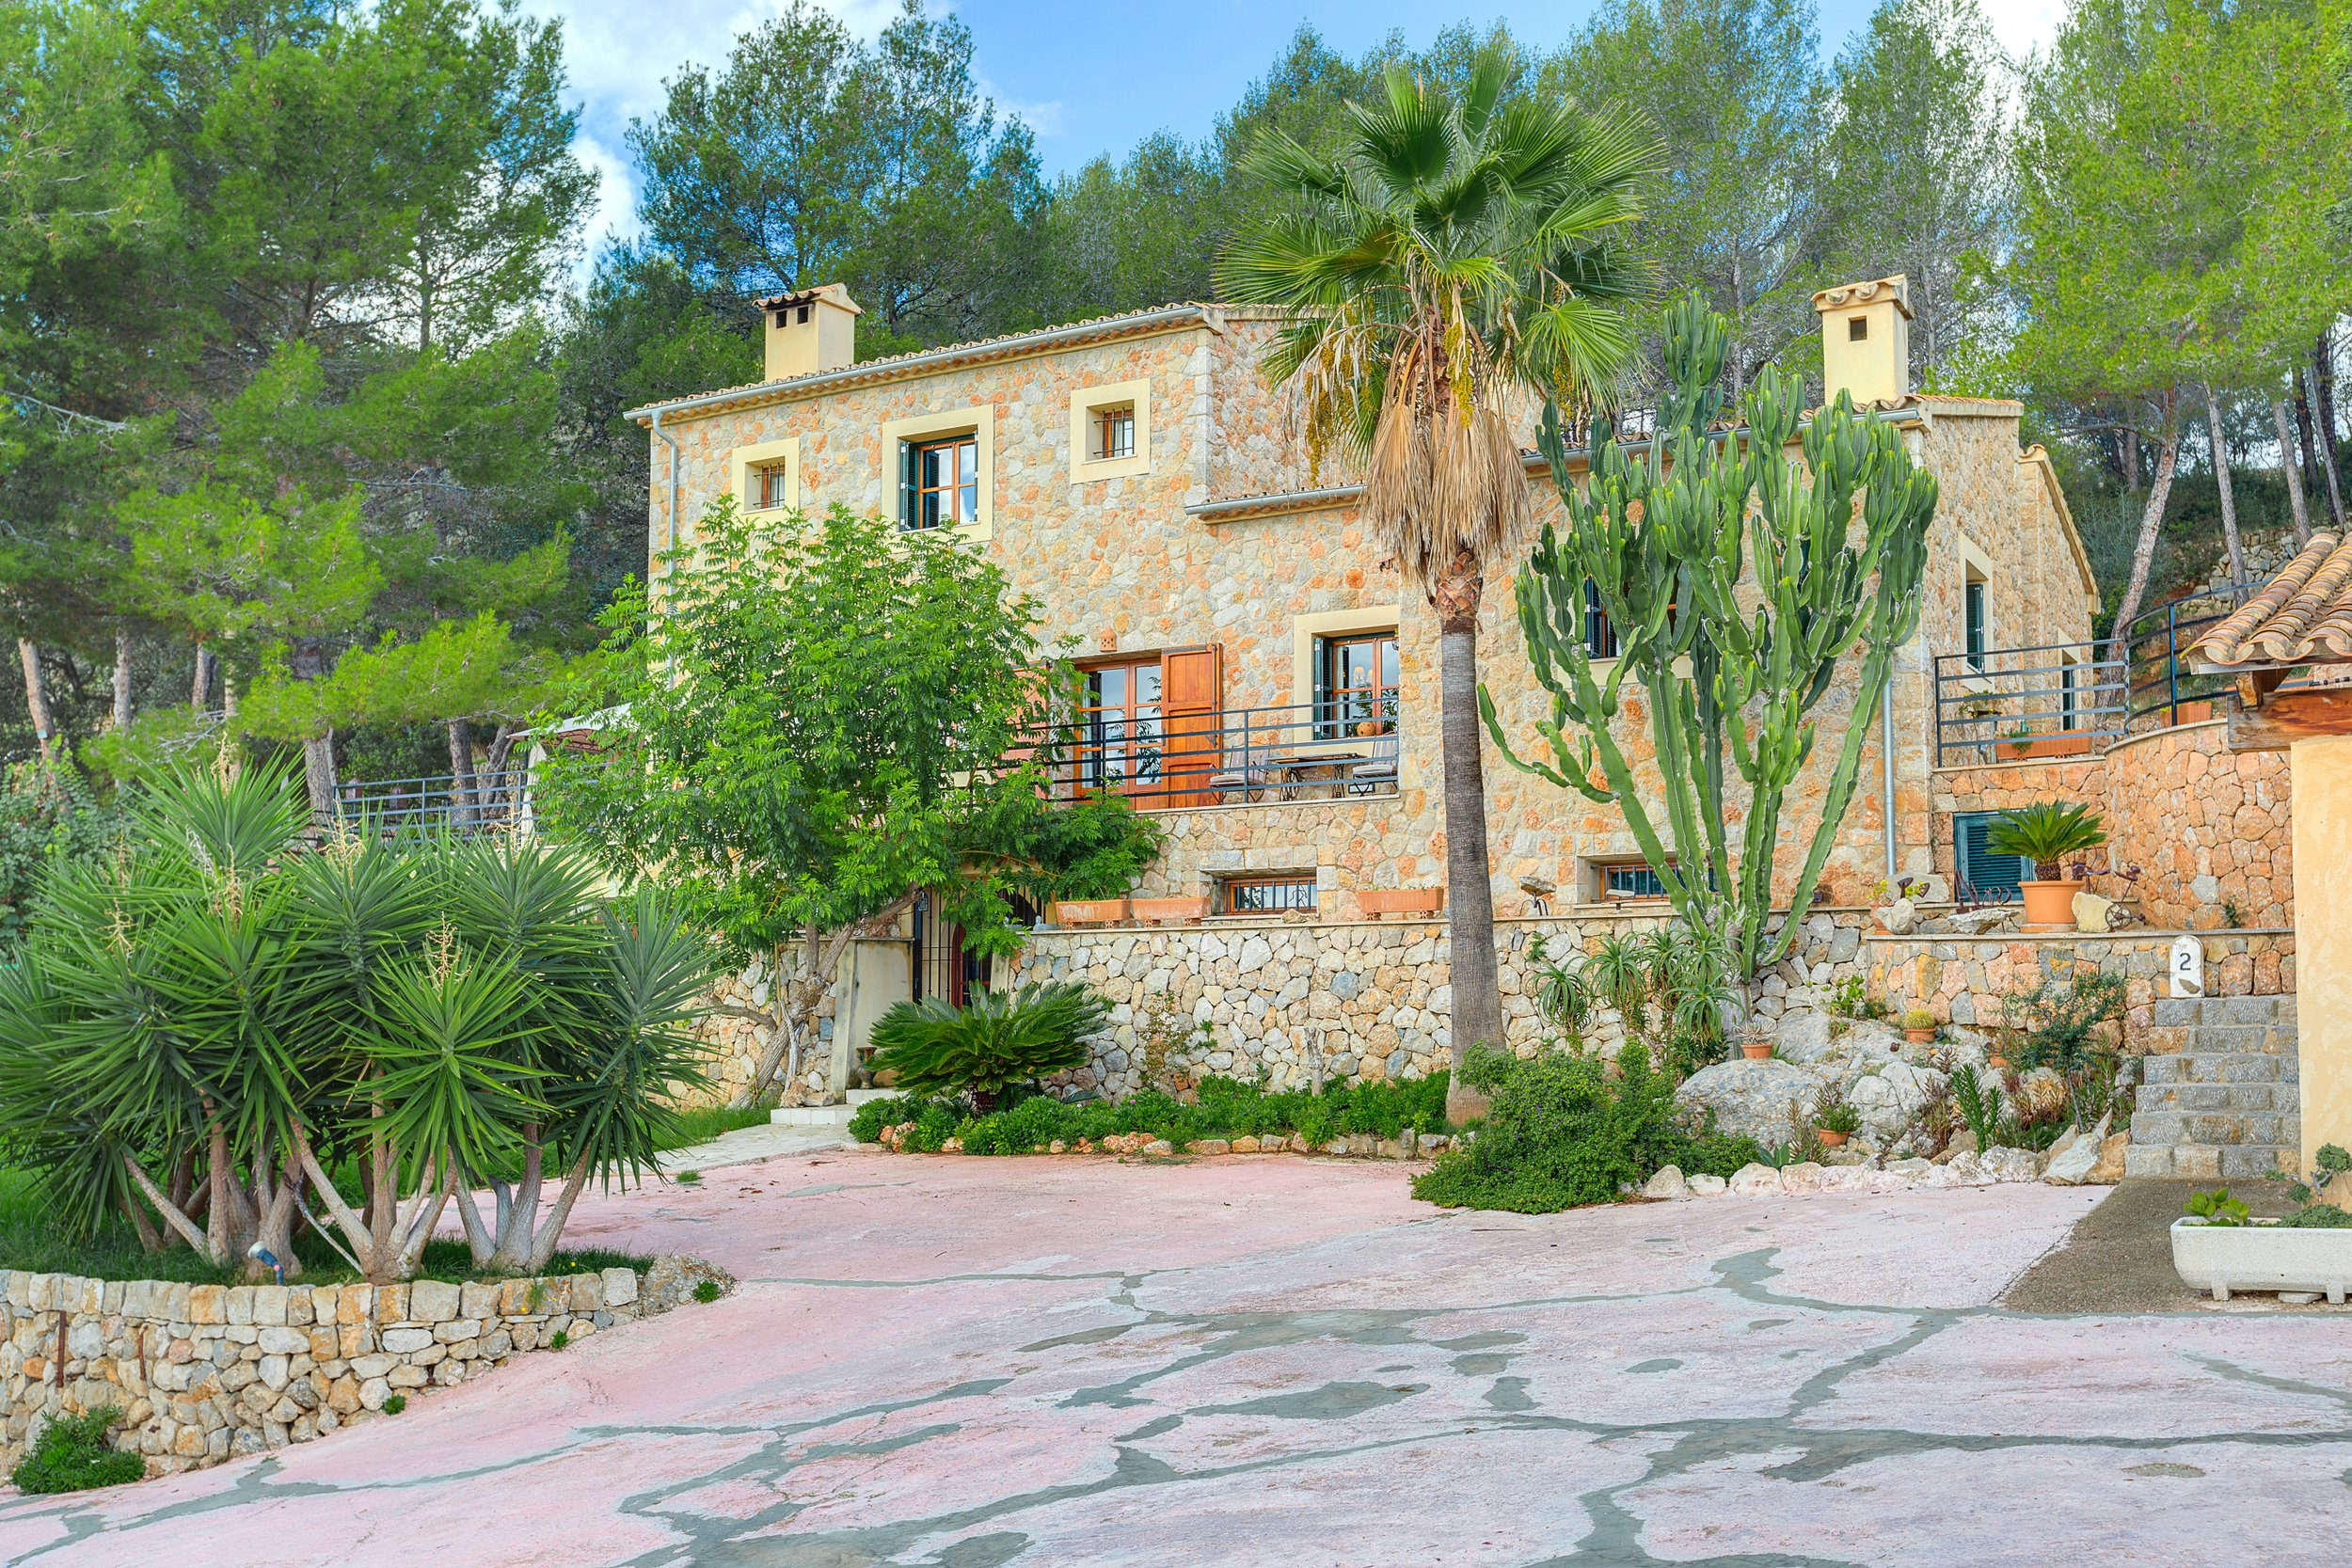 Maison de vacances Villa Cirera in Alaro (2611793), Alaro, Majorque, Iles Baléares, Espagne, image 6